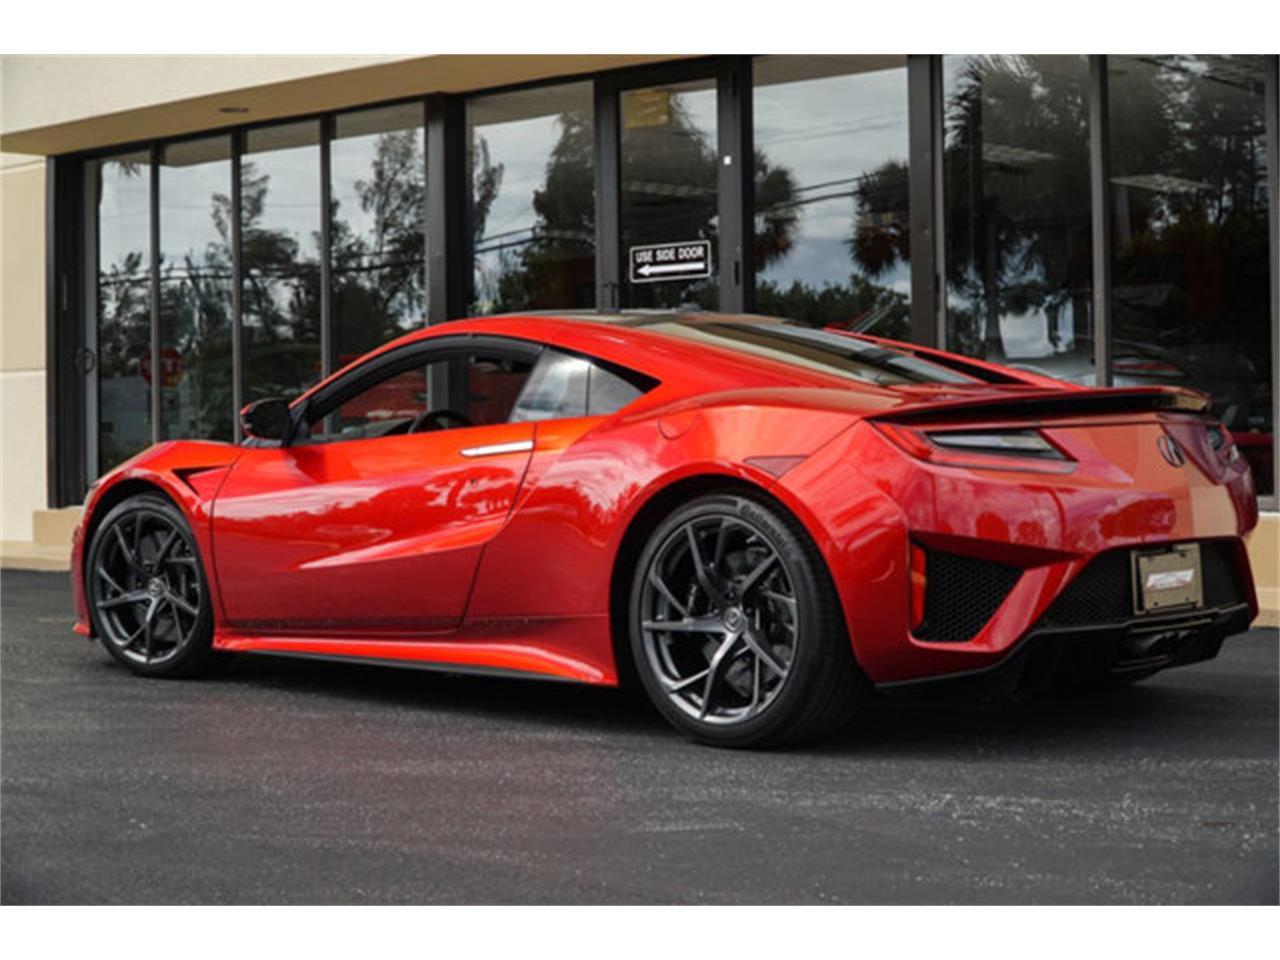 2017 Acura NSX for Sale | ClassicCars.com | CC-1192051